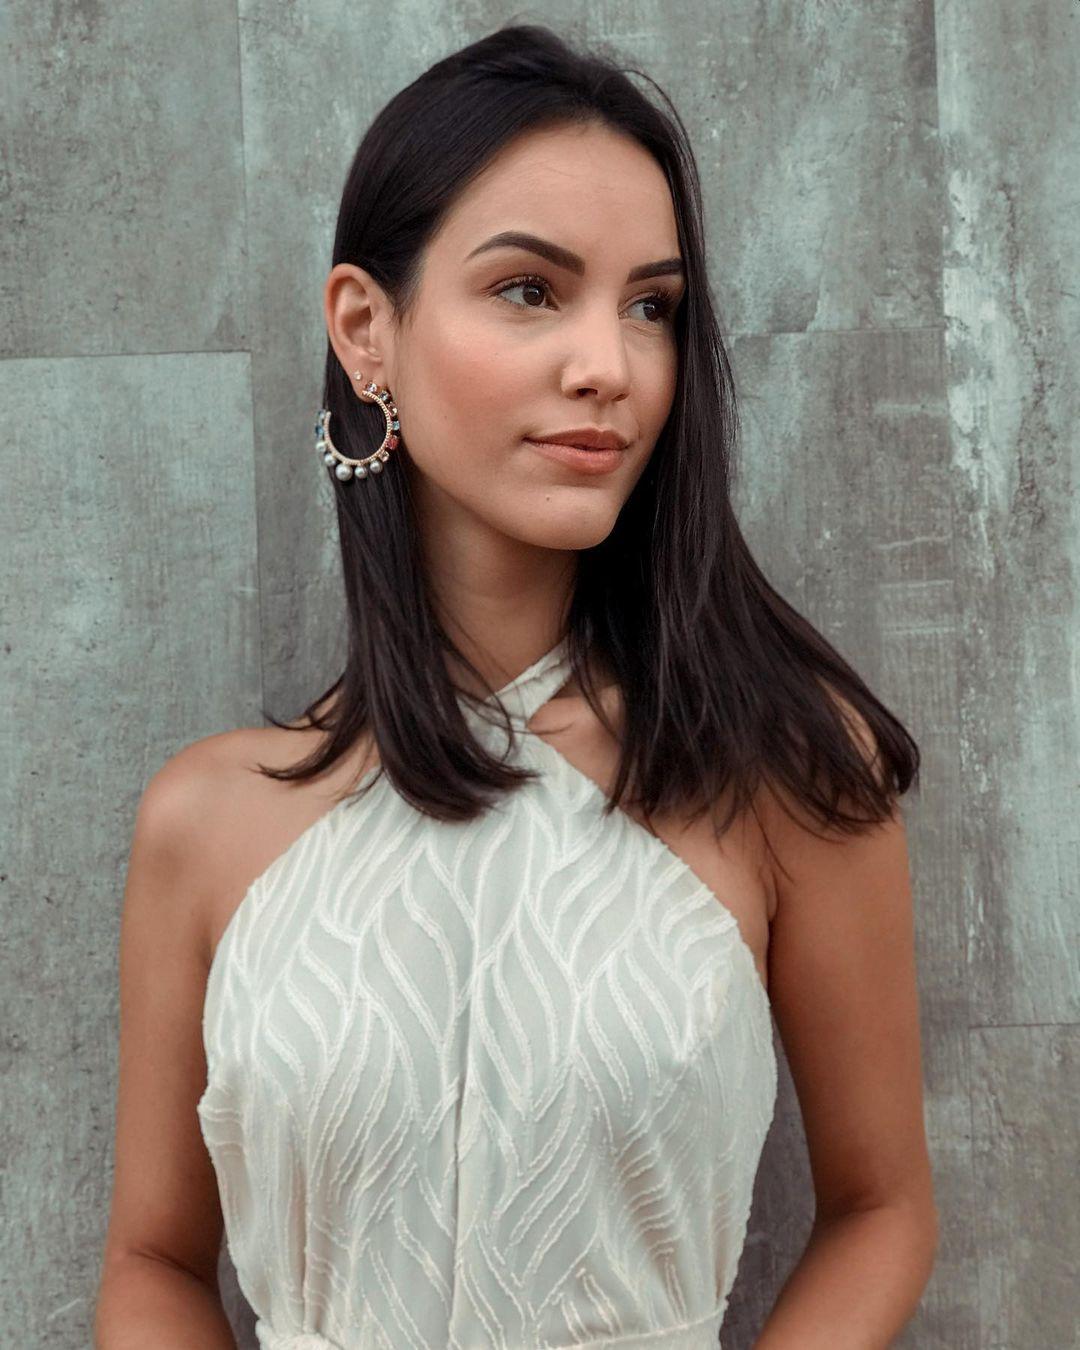 rafaella felipe, top 20 de miss brasil mundo 2019. - Página 3 Qtdfmx10